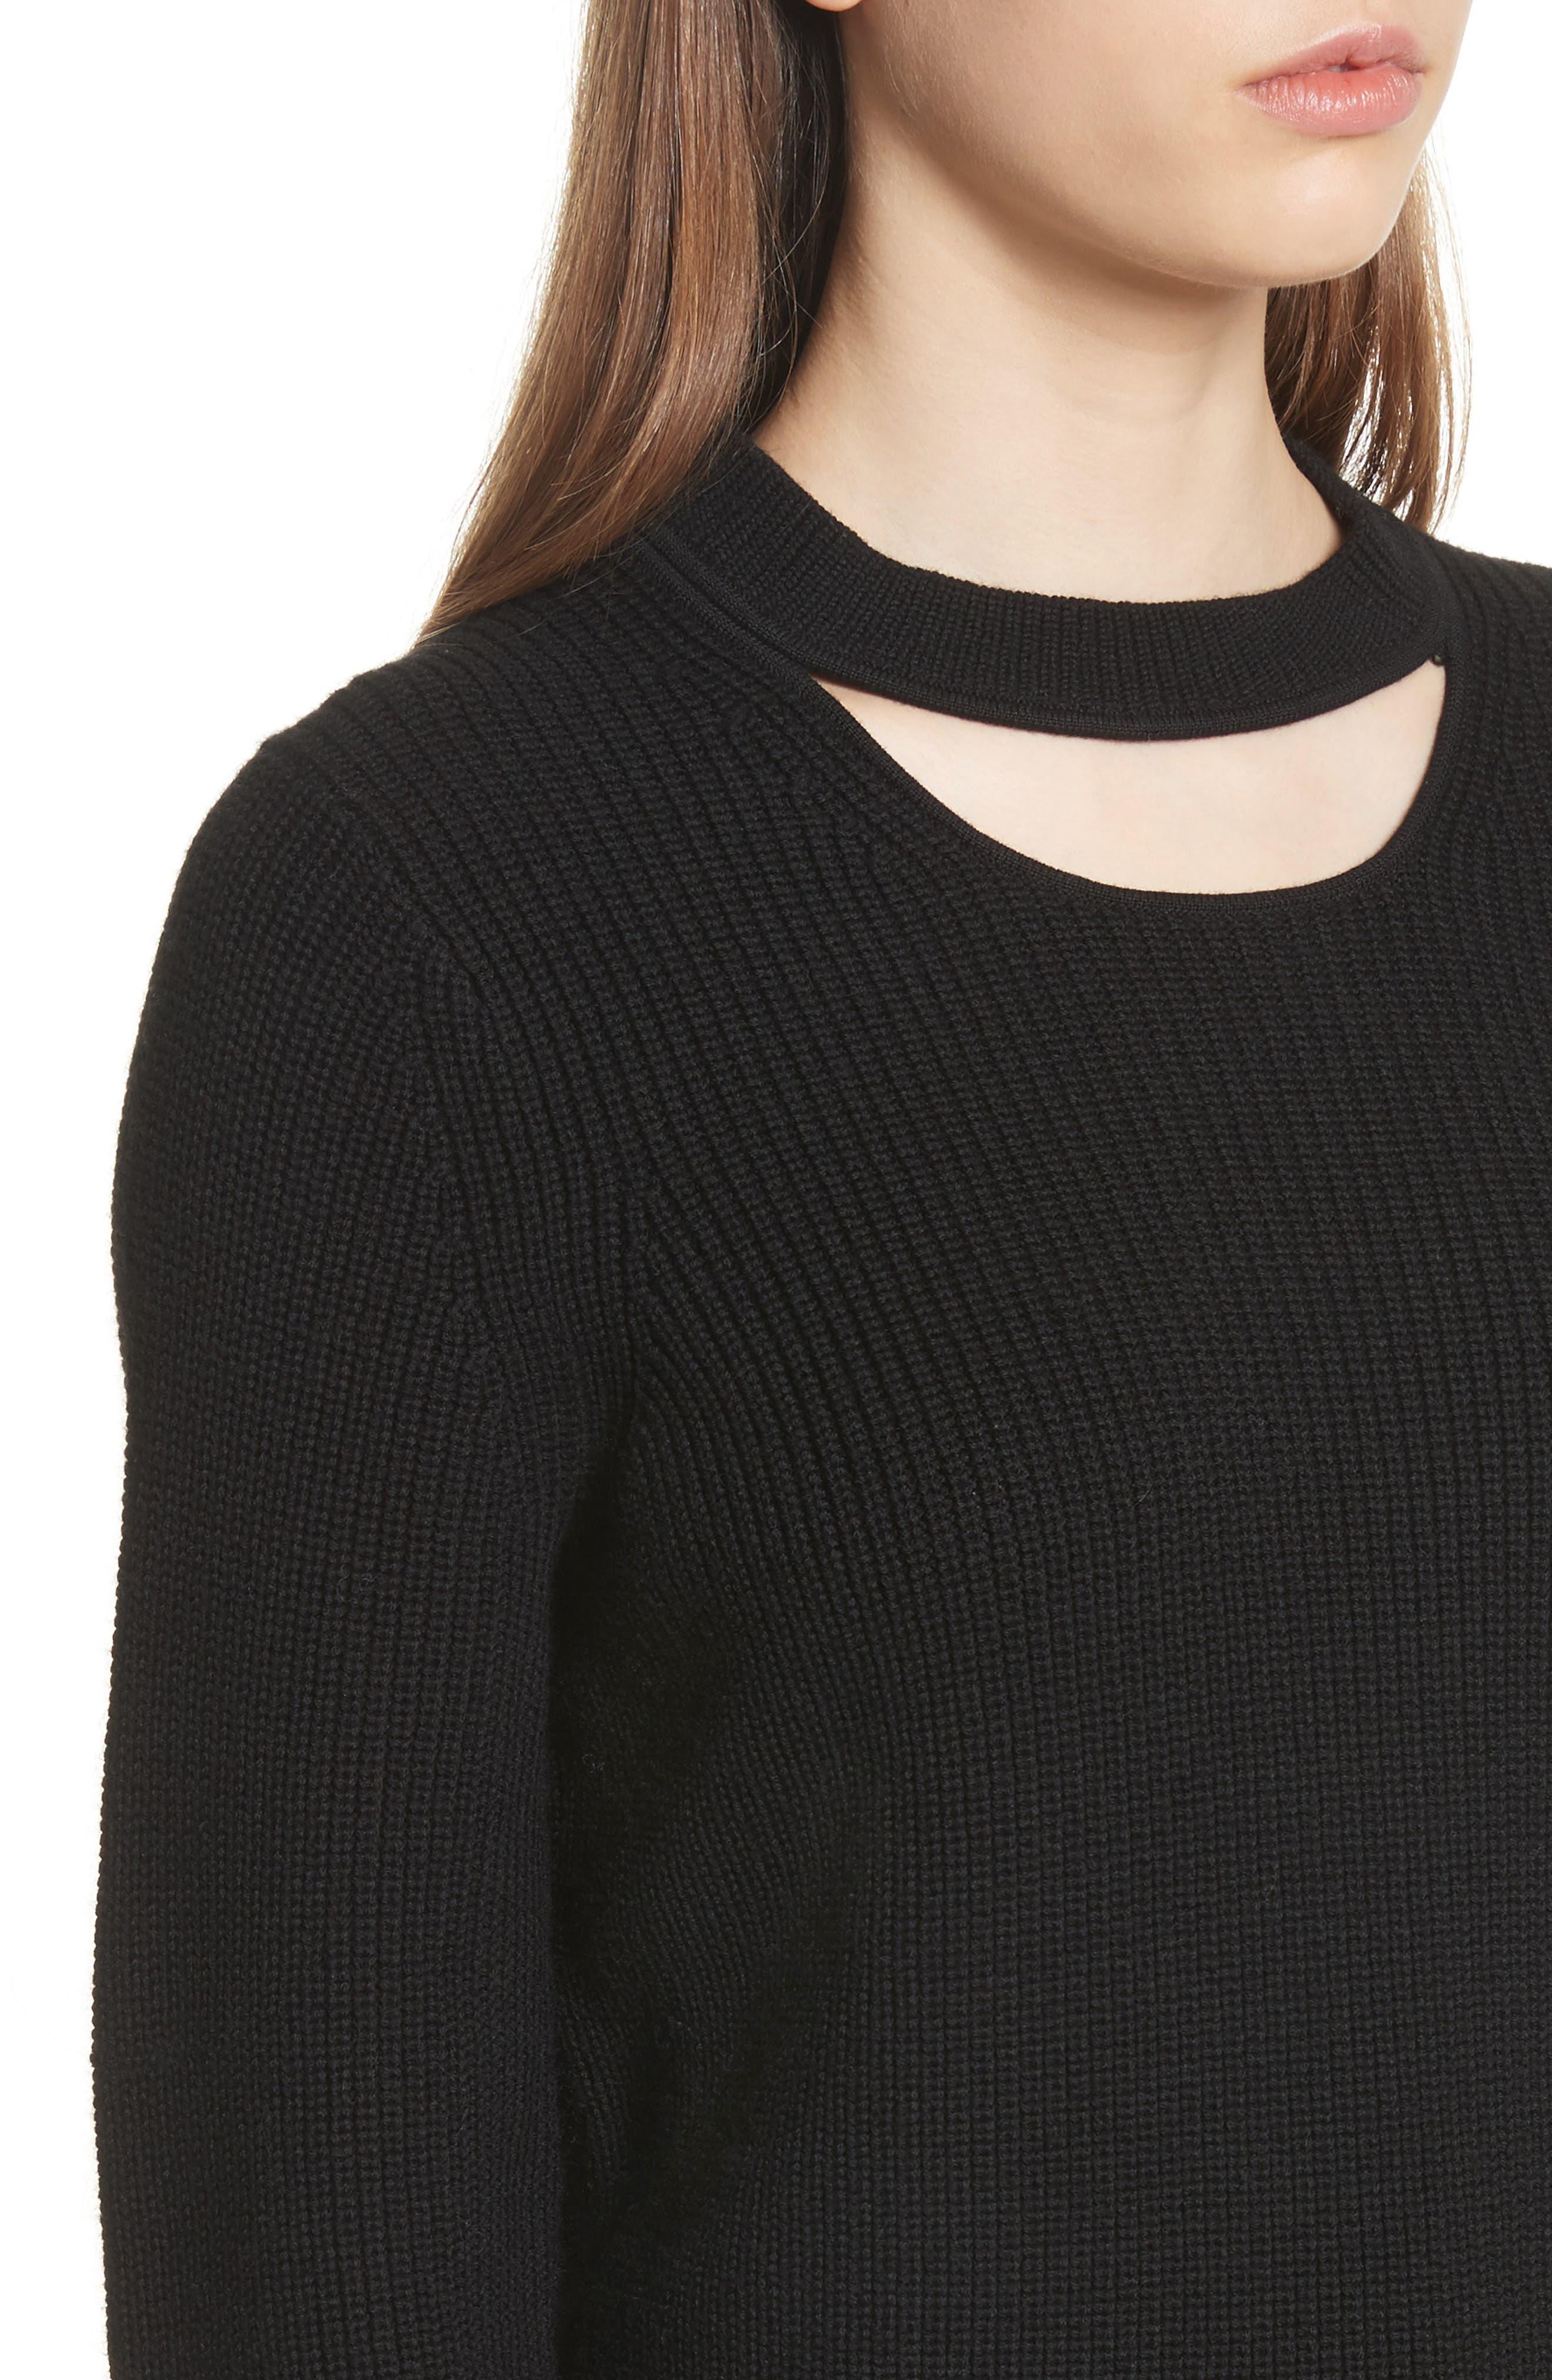 Tori Cutout Sweatshirt,                             Alternate thumbnail 4, color,                             001